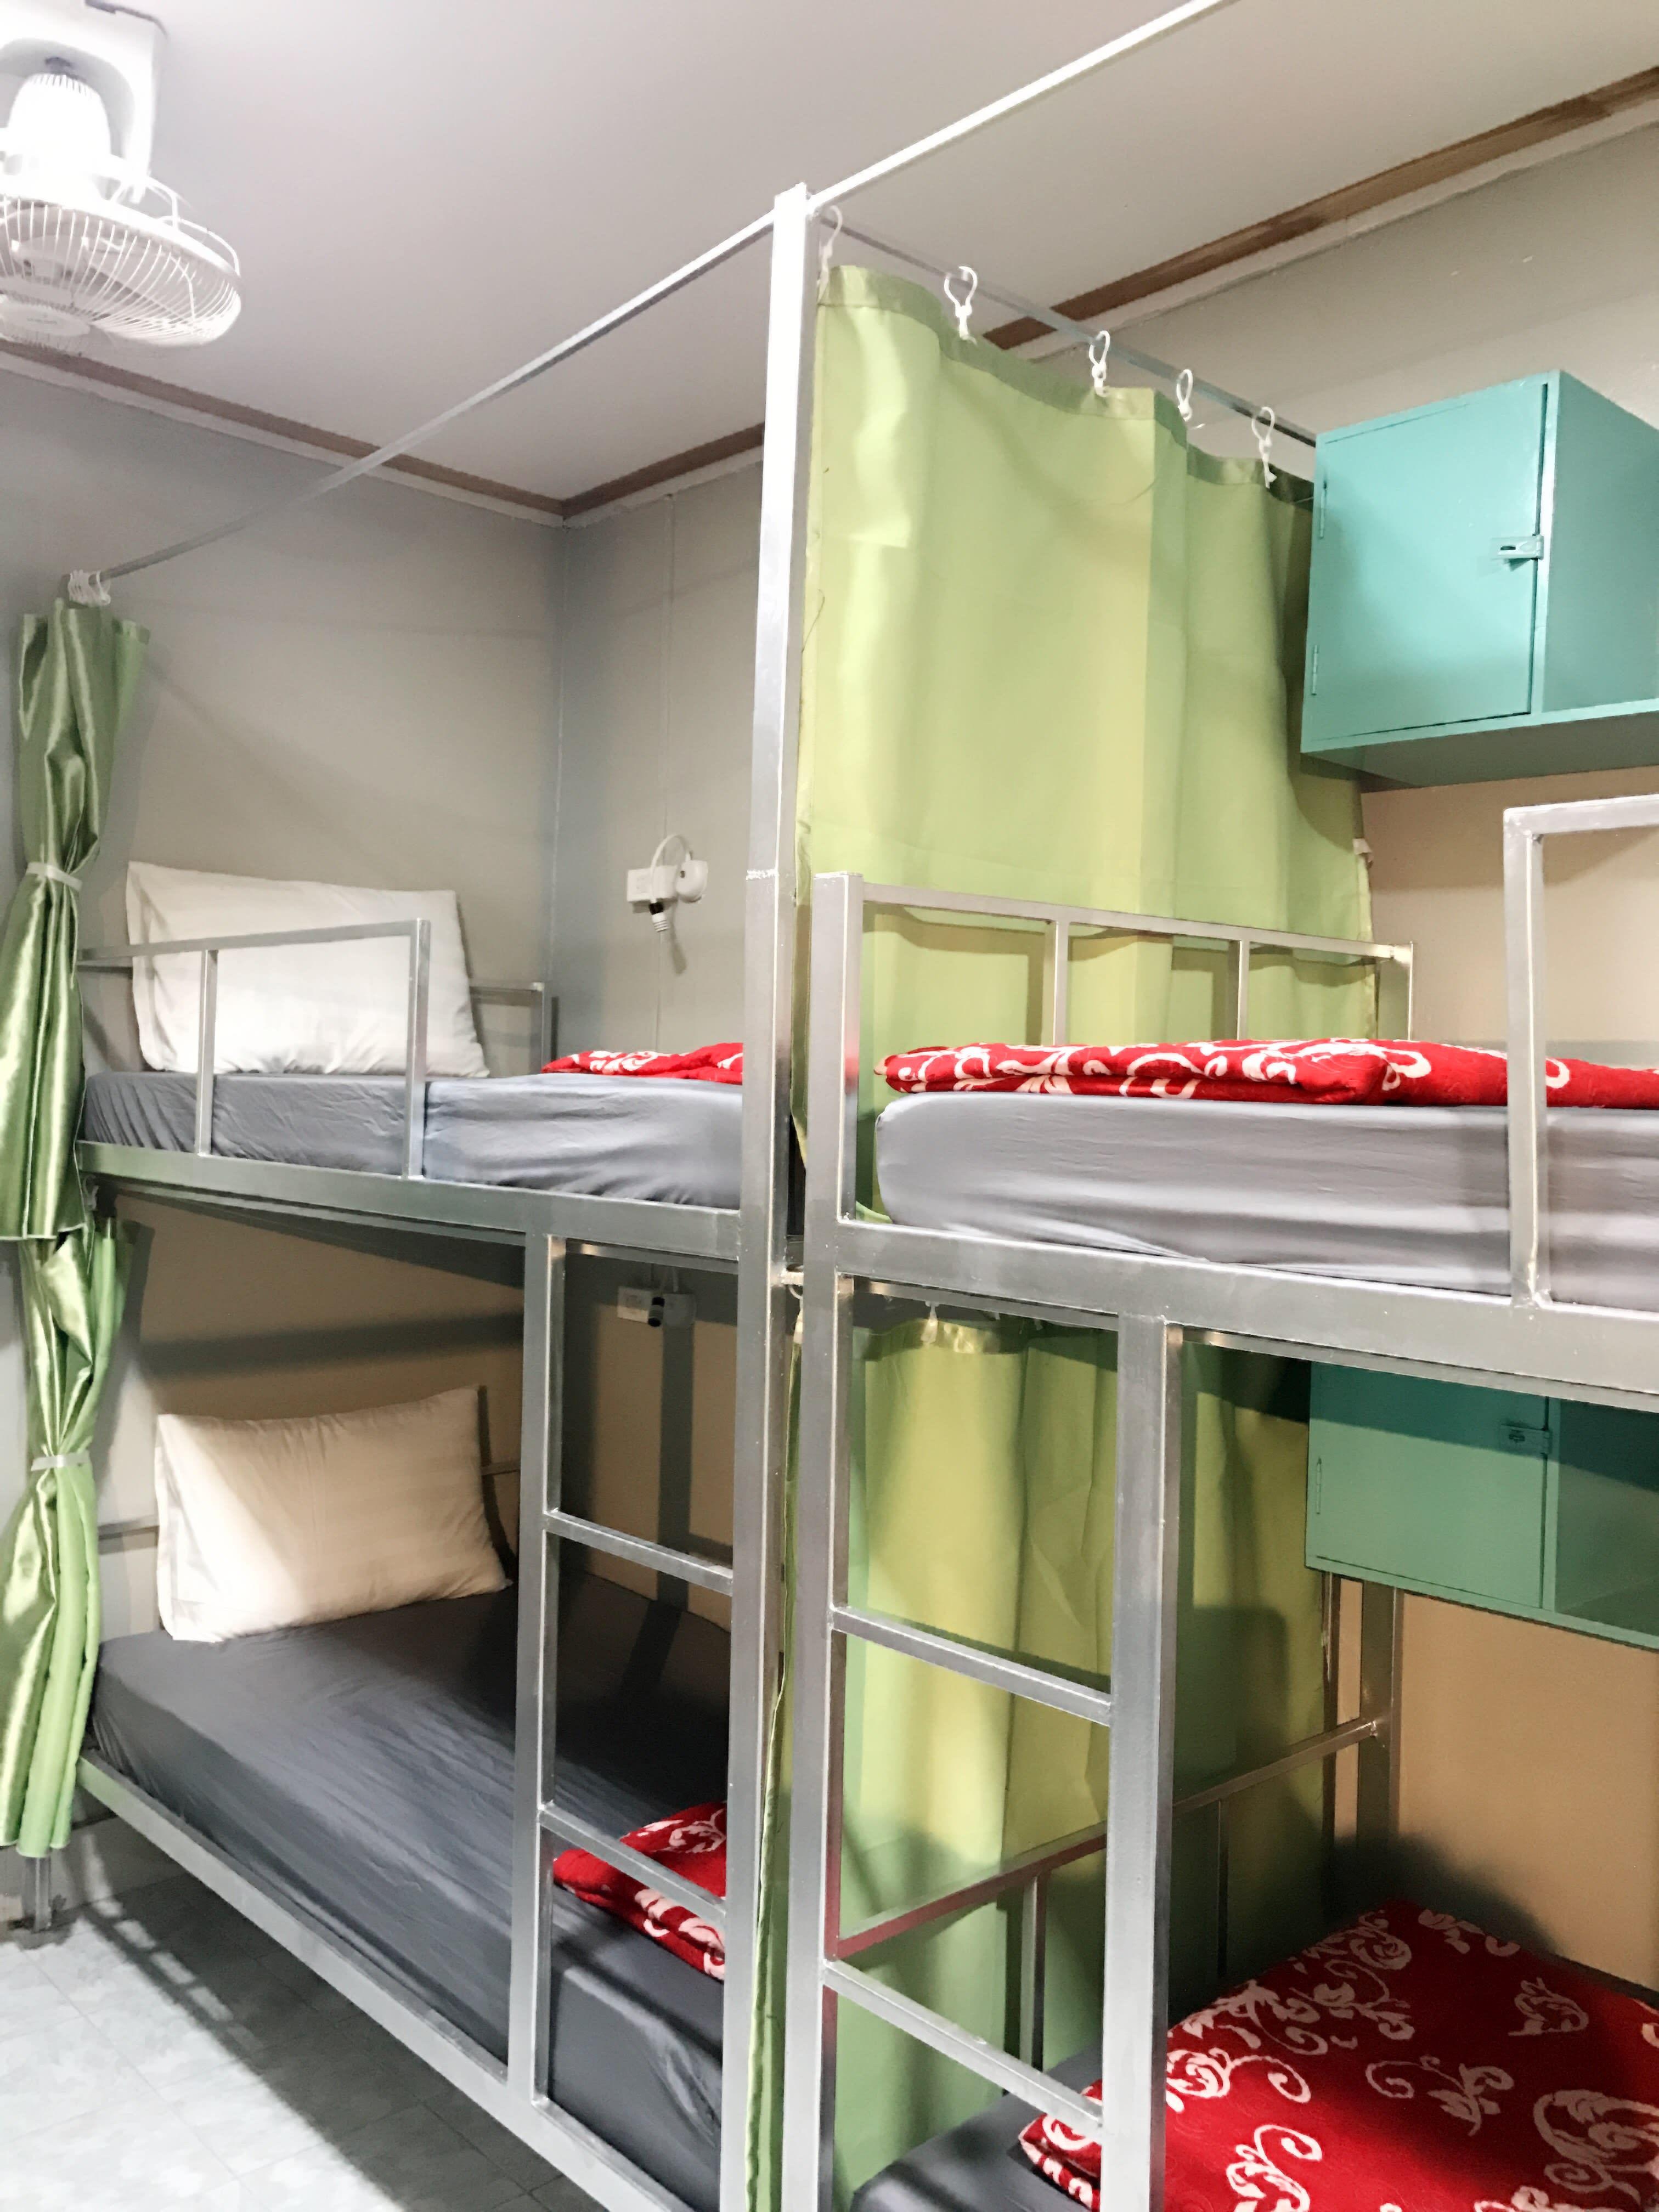 HOSTEL - DownTown Backpackers Hostel